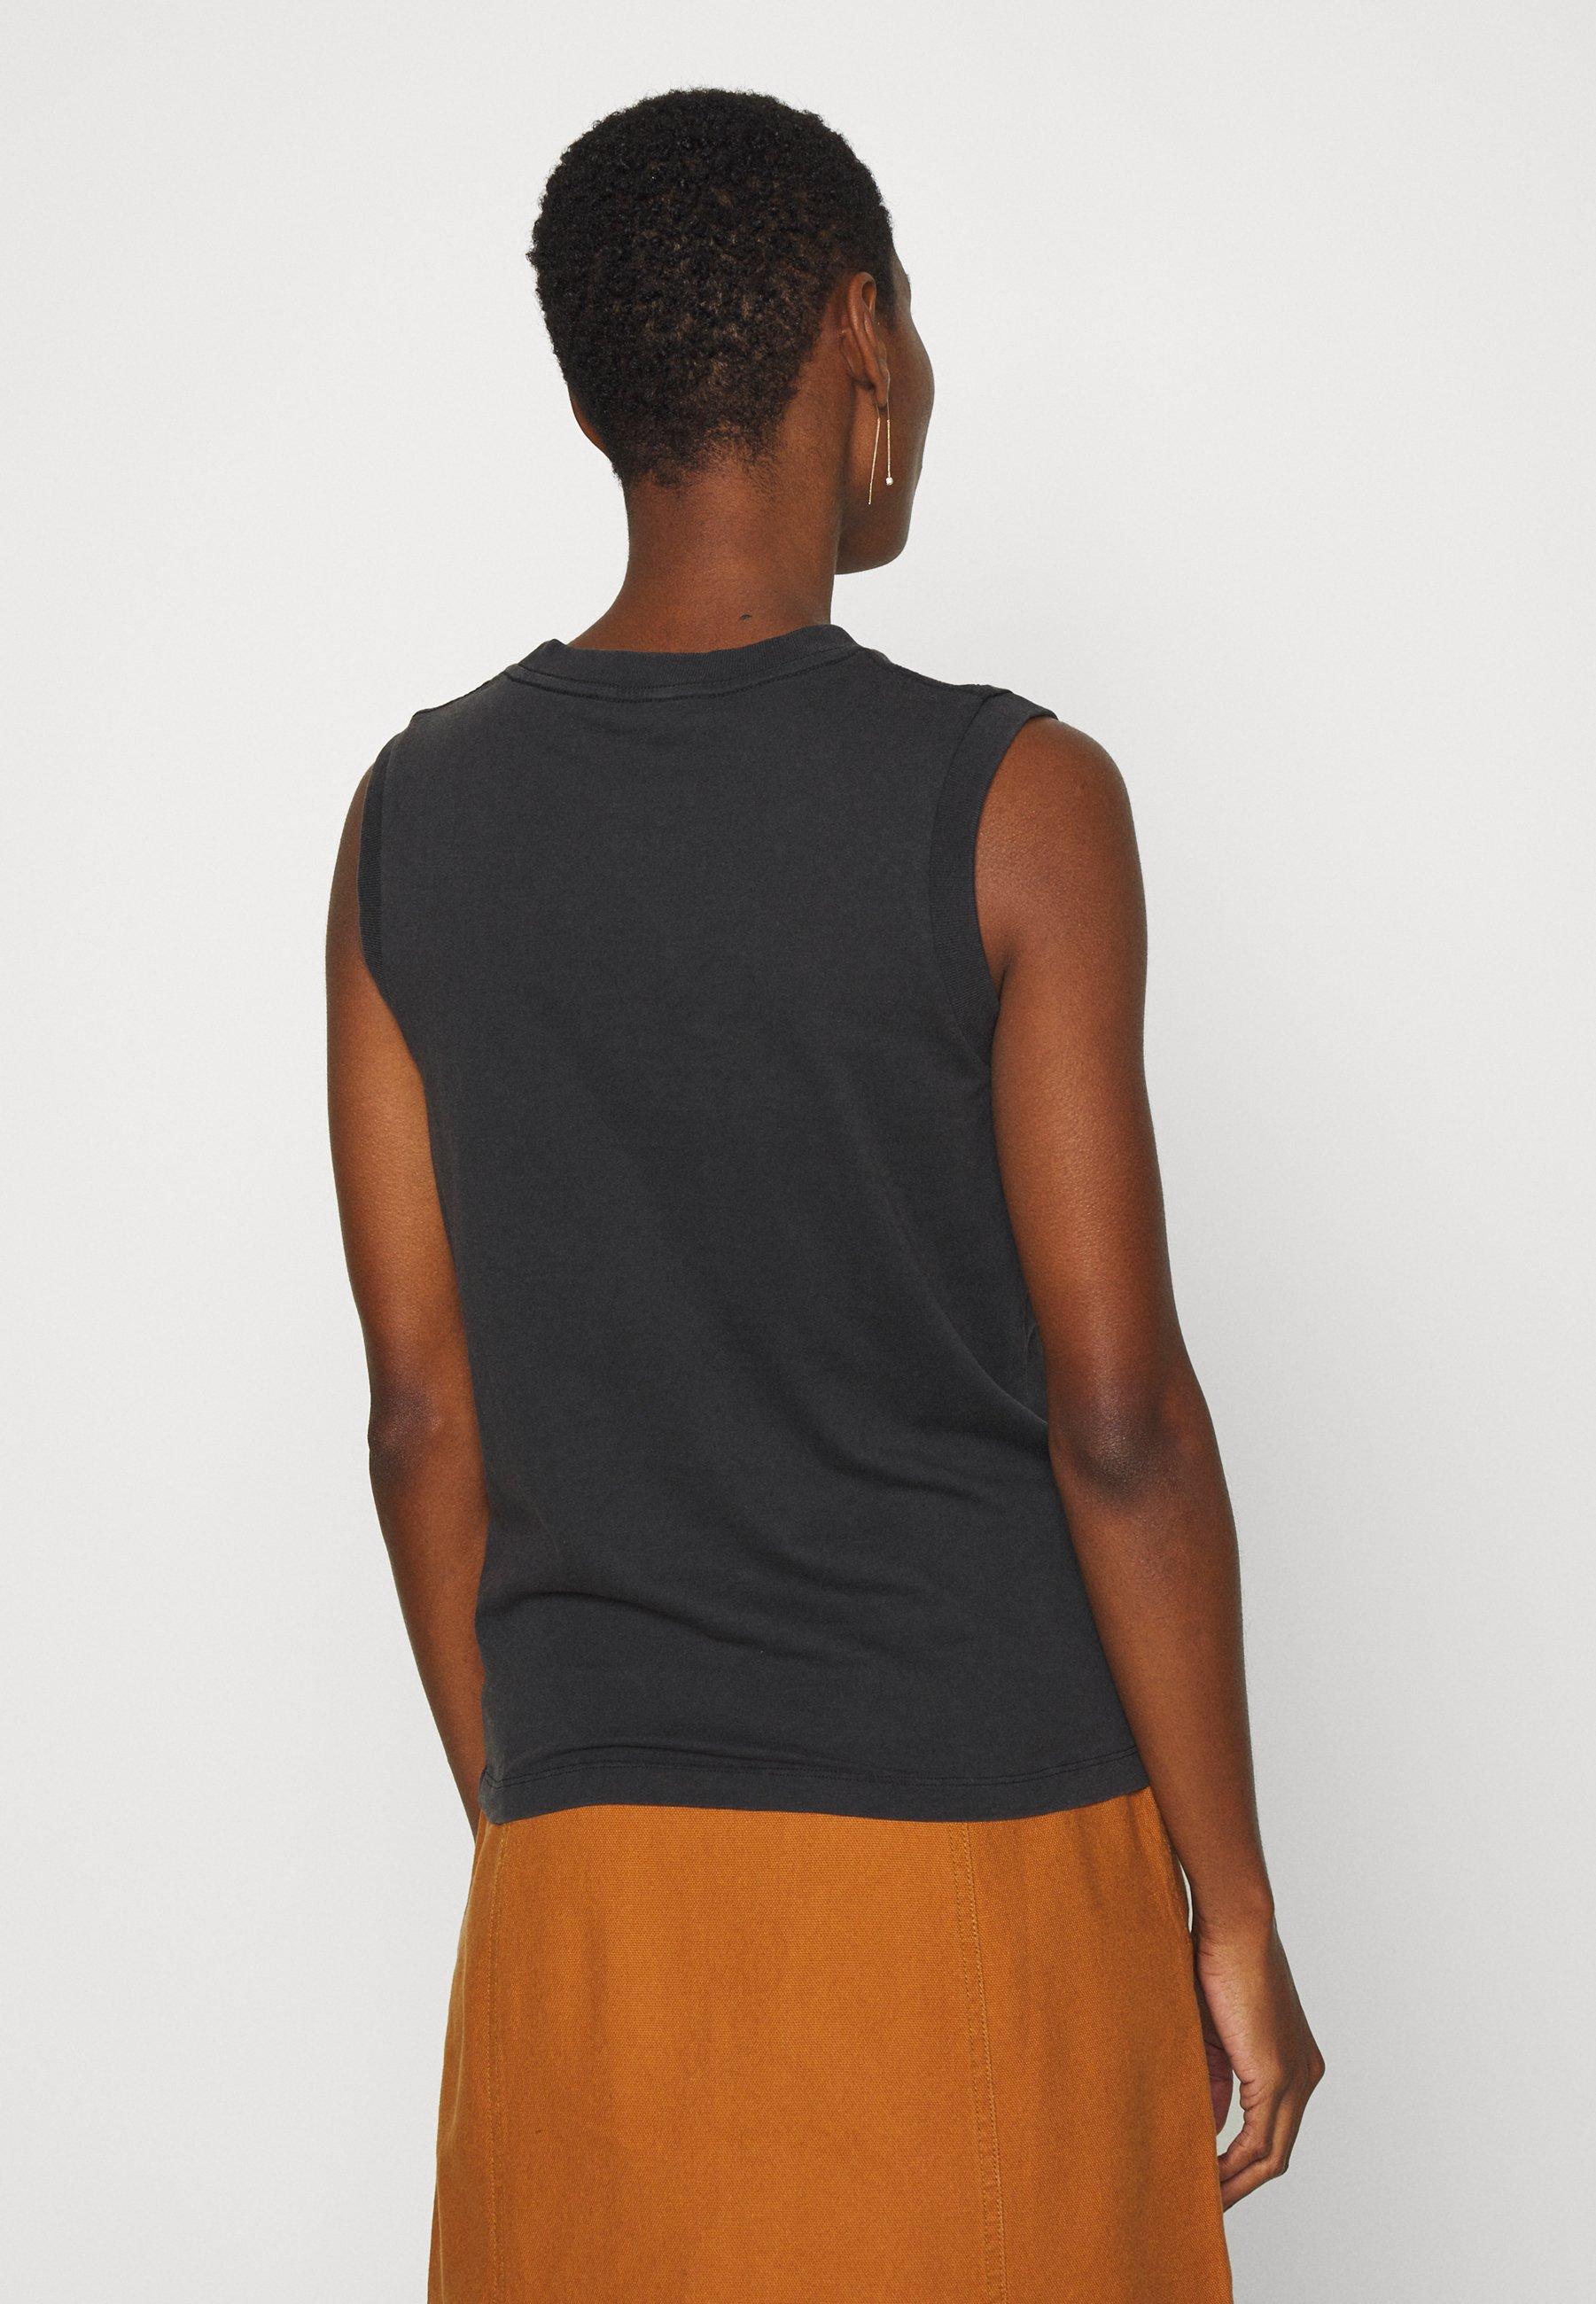 AllSaints PRIDE IMMY TANK - Débardeur - black - Tops & T-shirts Femme H0V3T